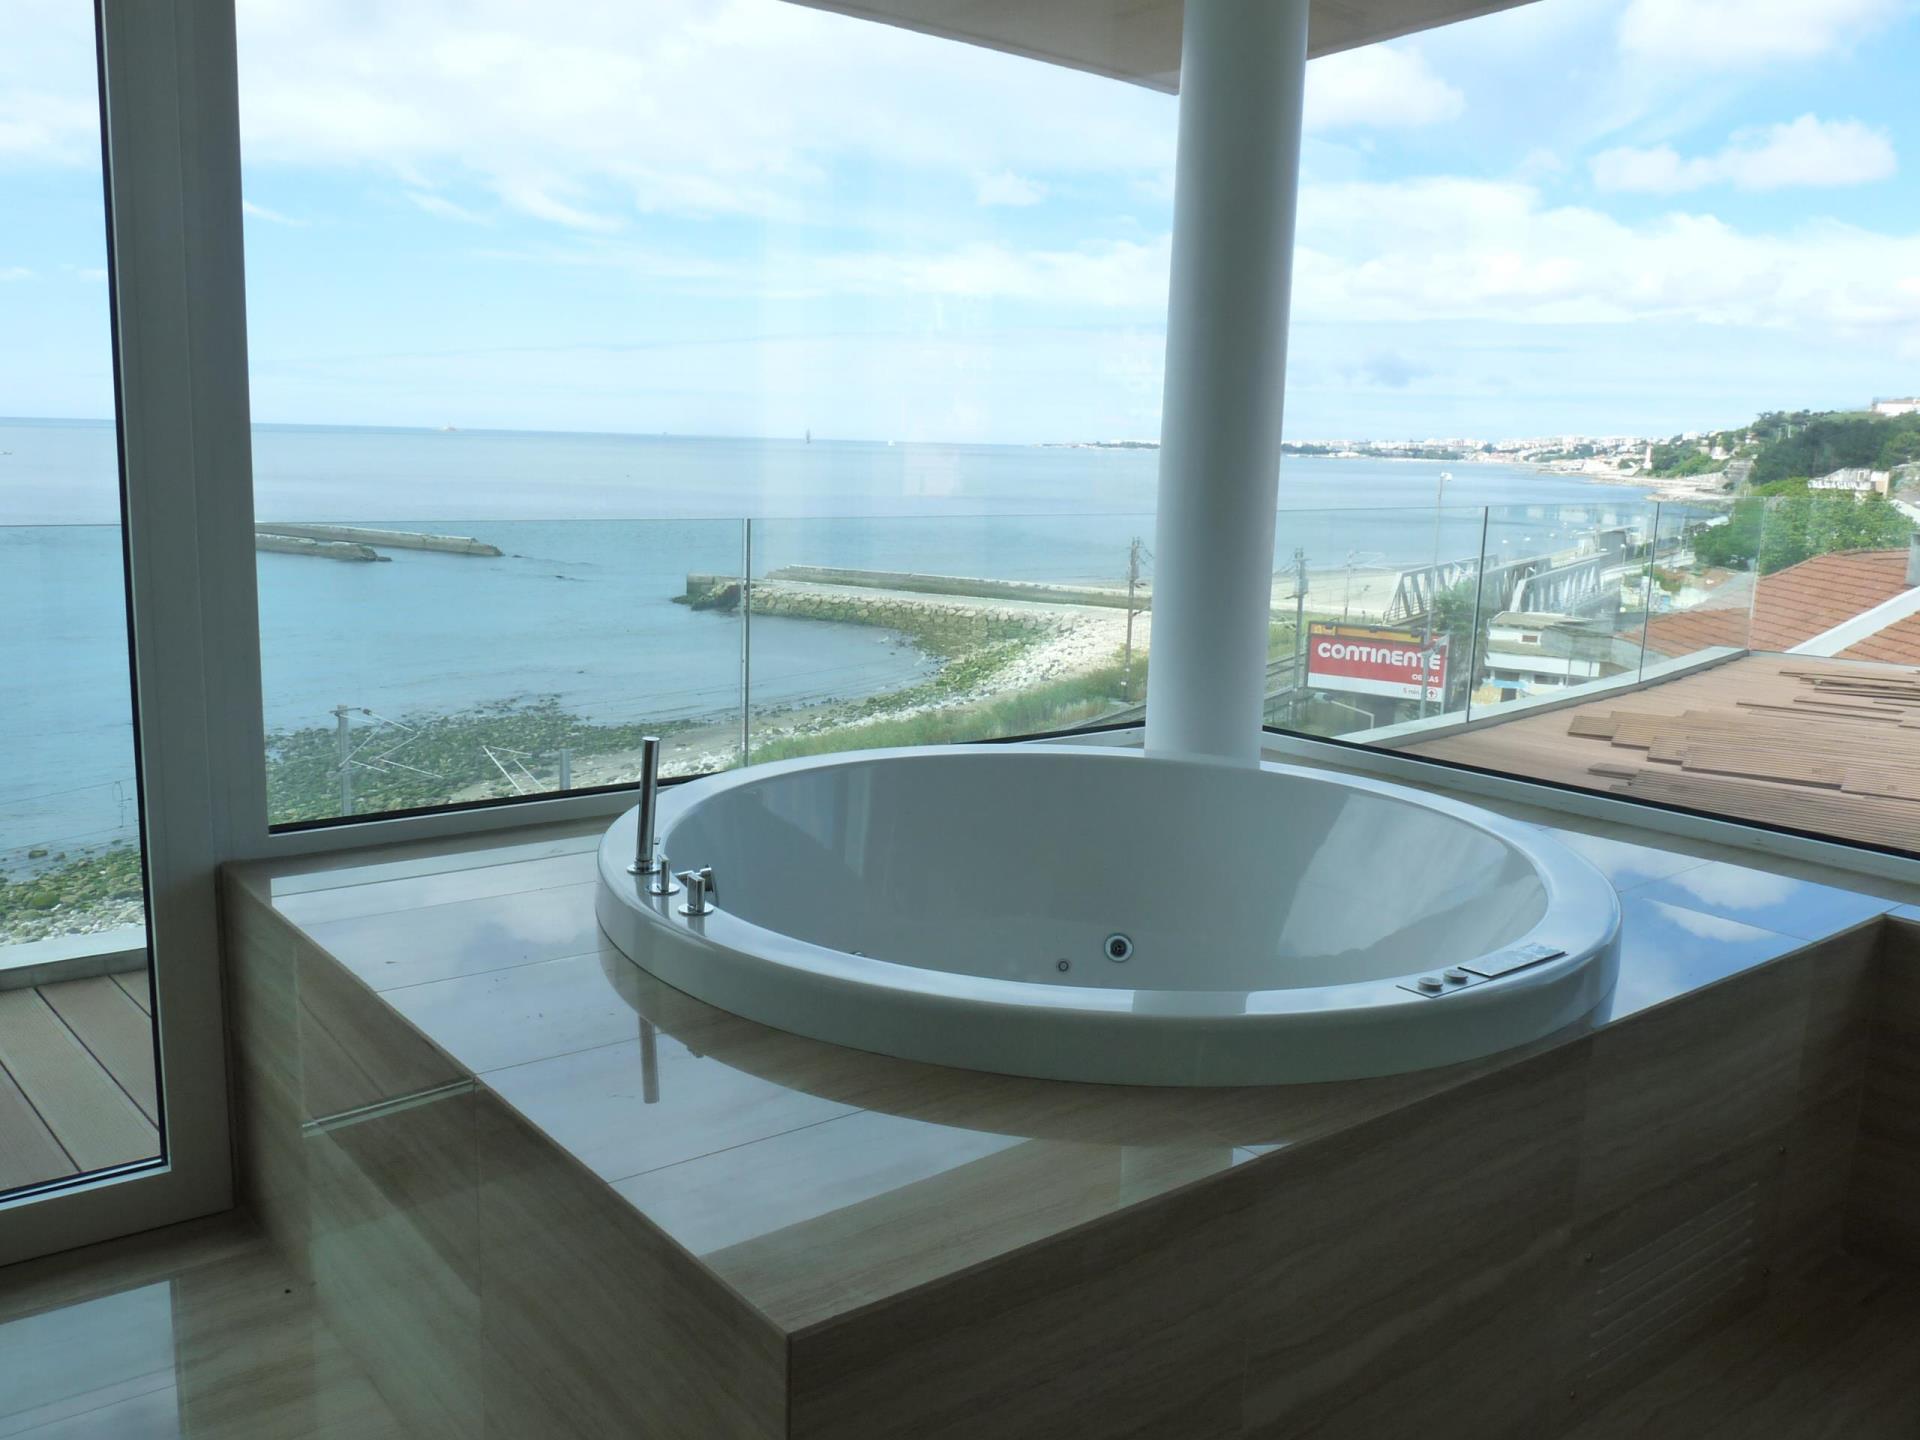 Duplex 为 销售 在 Duplex, 3 bedrooms, for Sale Oeiras, 葡京 葡萄牙